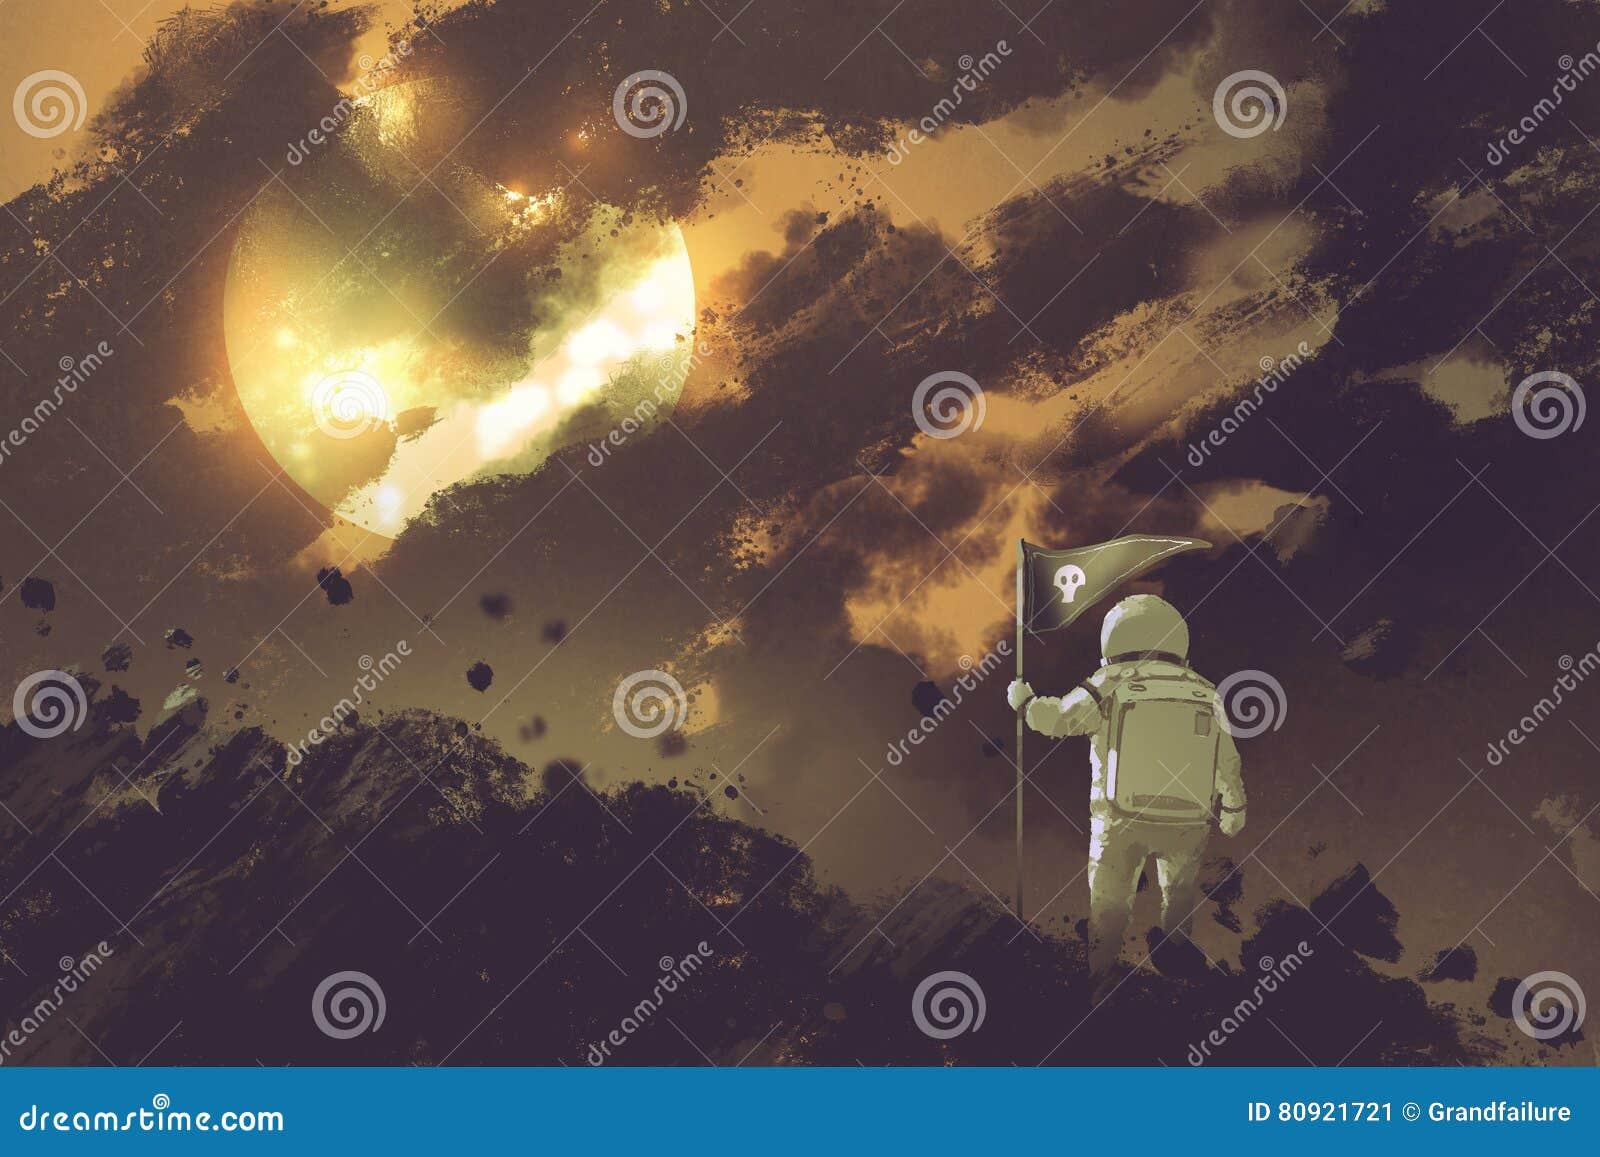 Астронавт при флаг стоя на горе против облачного неба